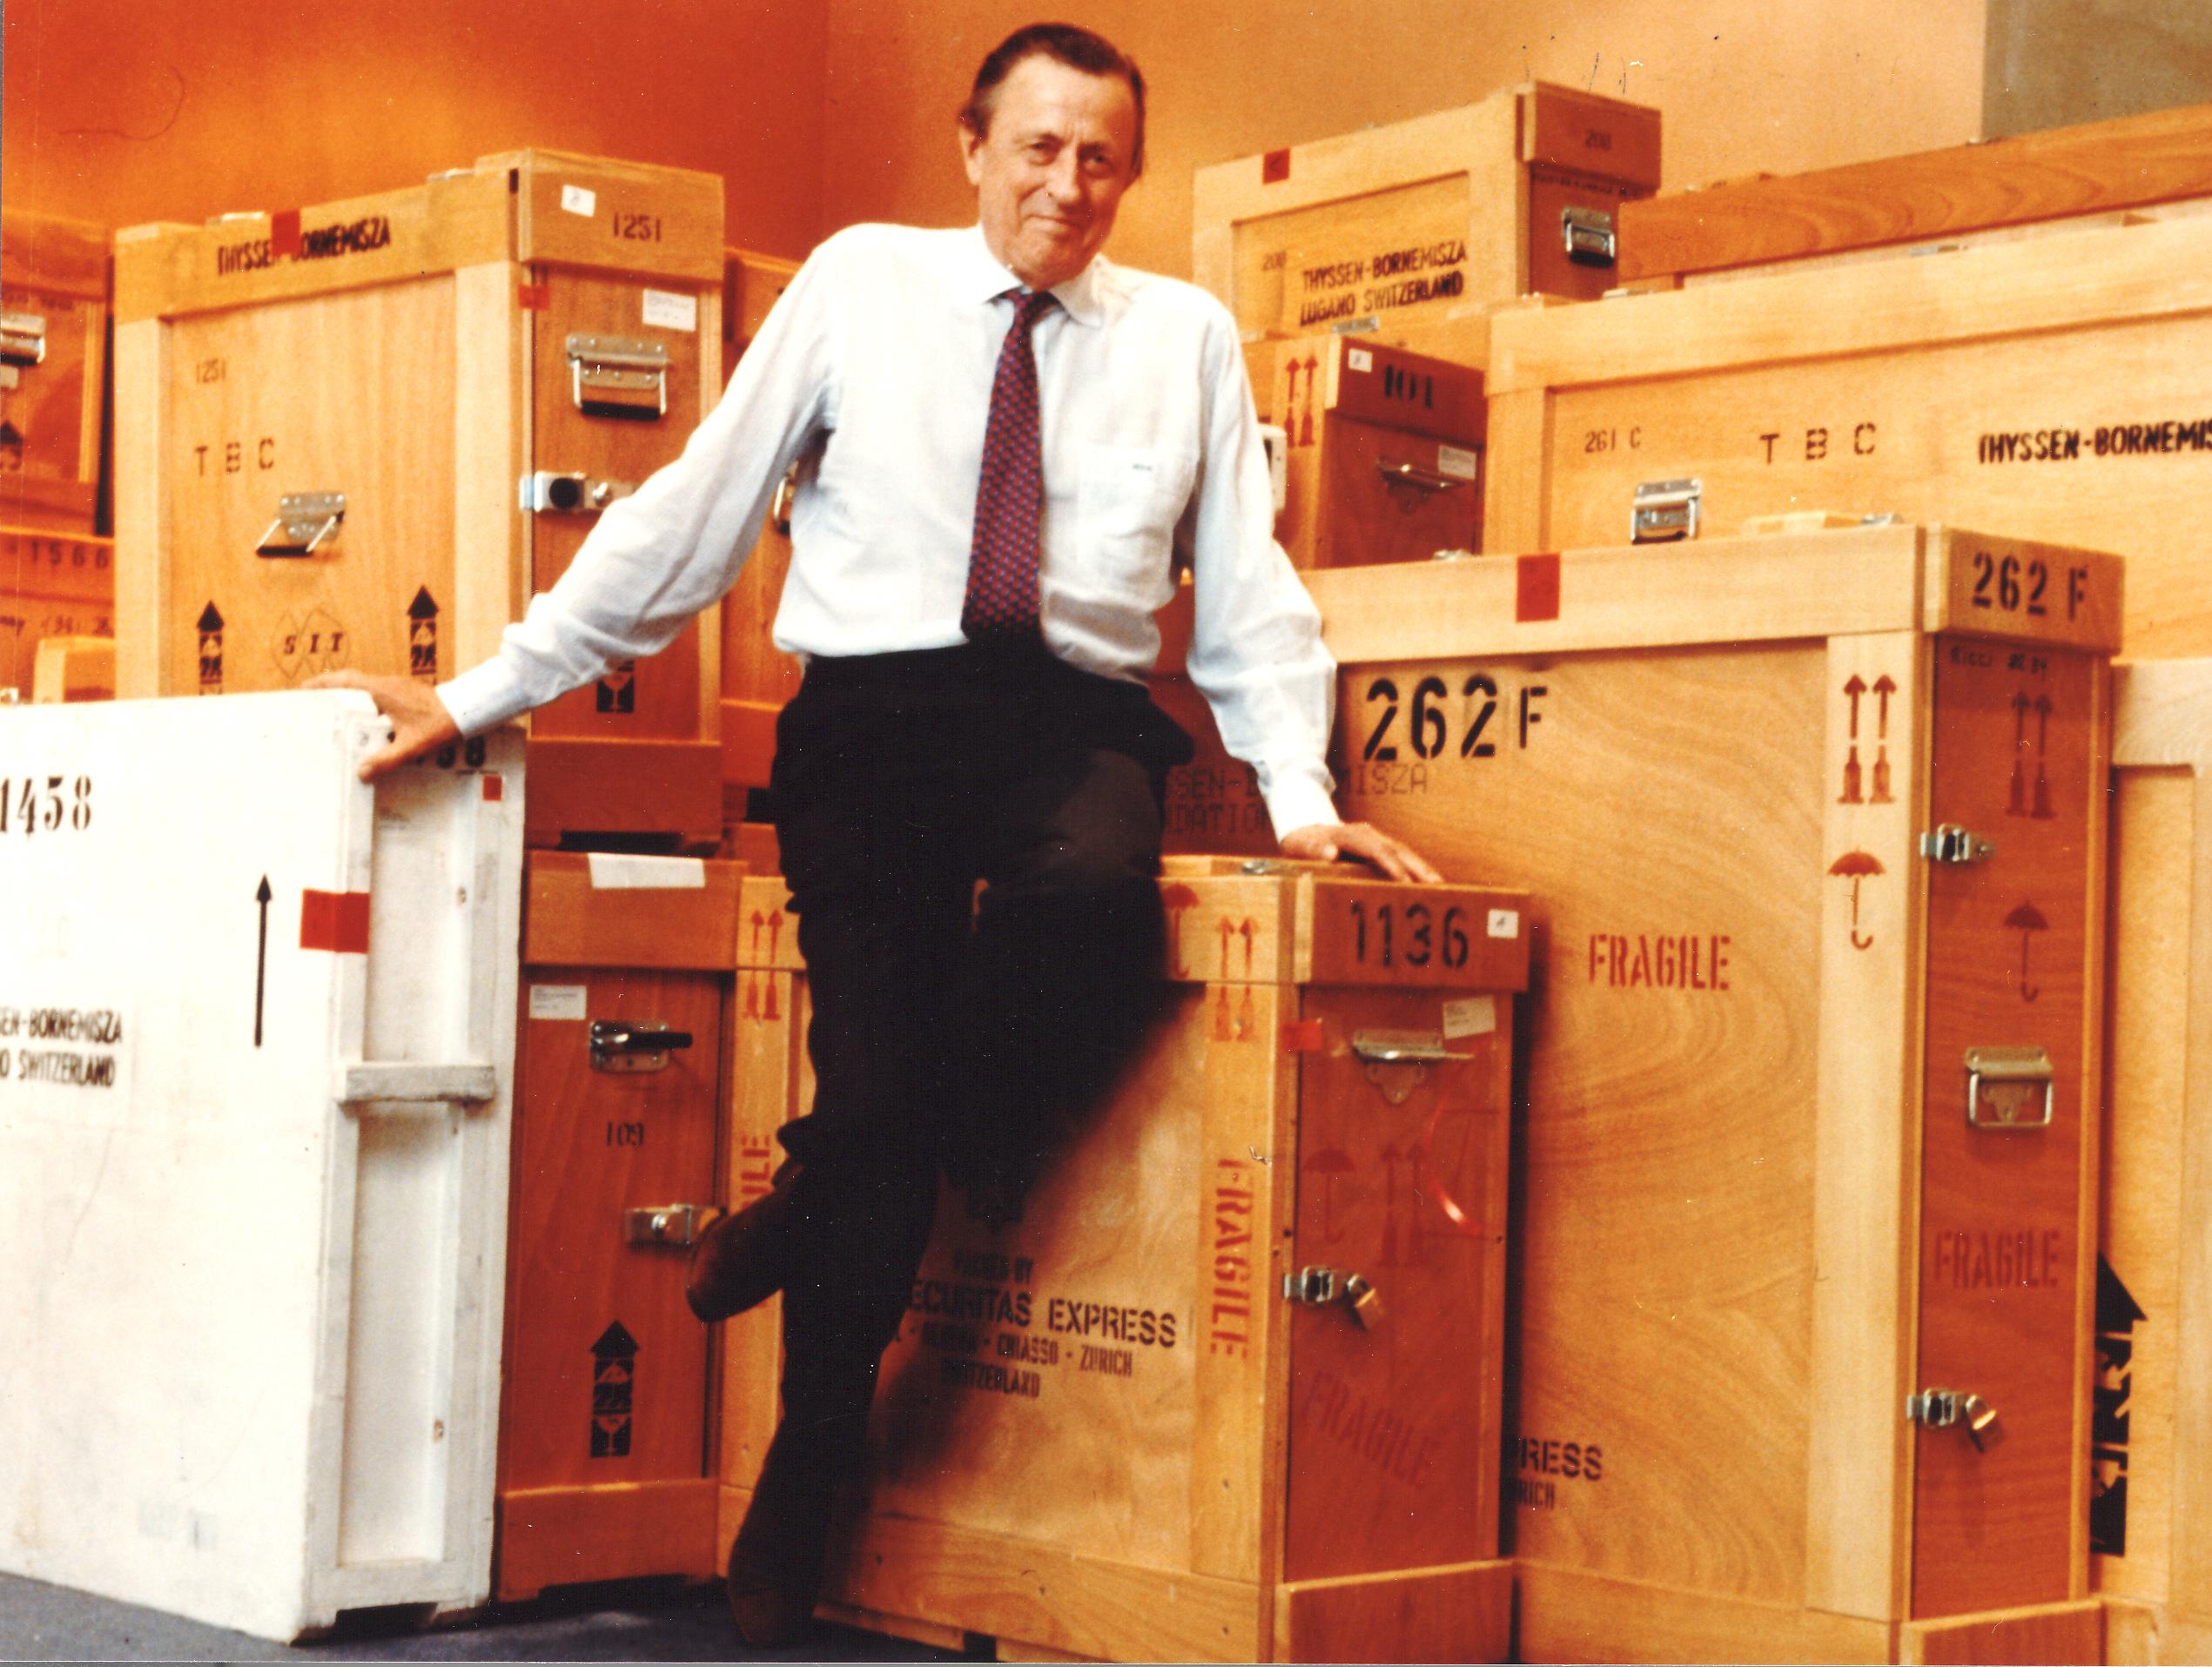 baron-thyssen-traslado-cajas-1992.jpg